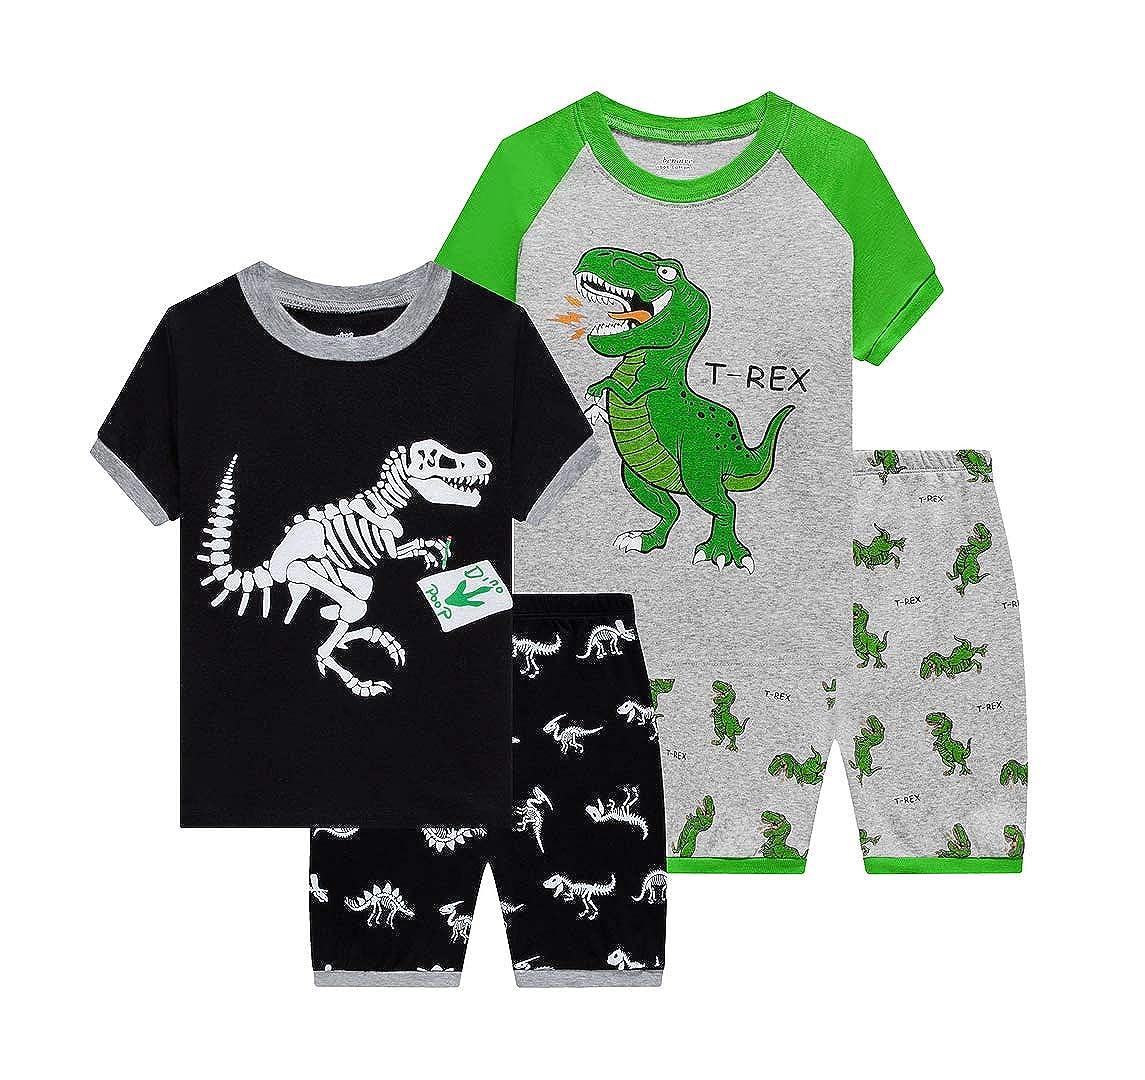 Benaive Pajamas for Boys Pjs for Boy Cotton Pajama 4-Piece Children Sleepwear Pants Set